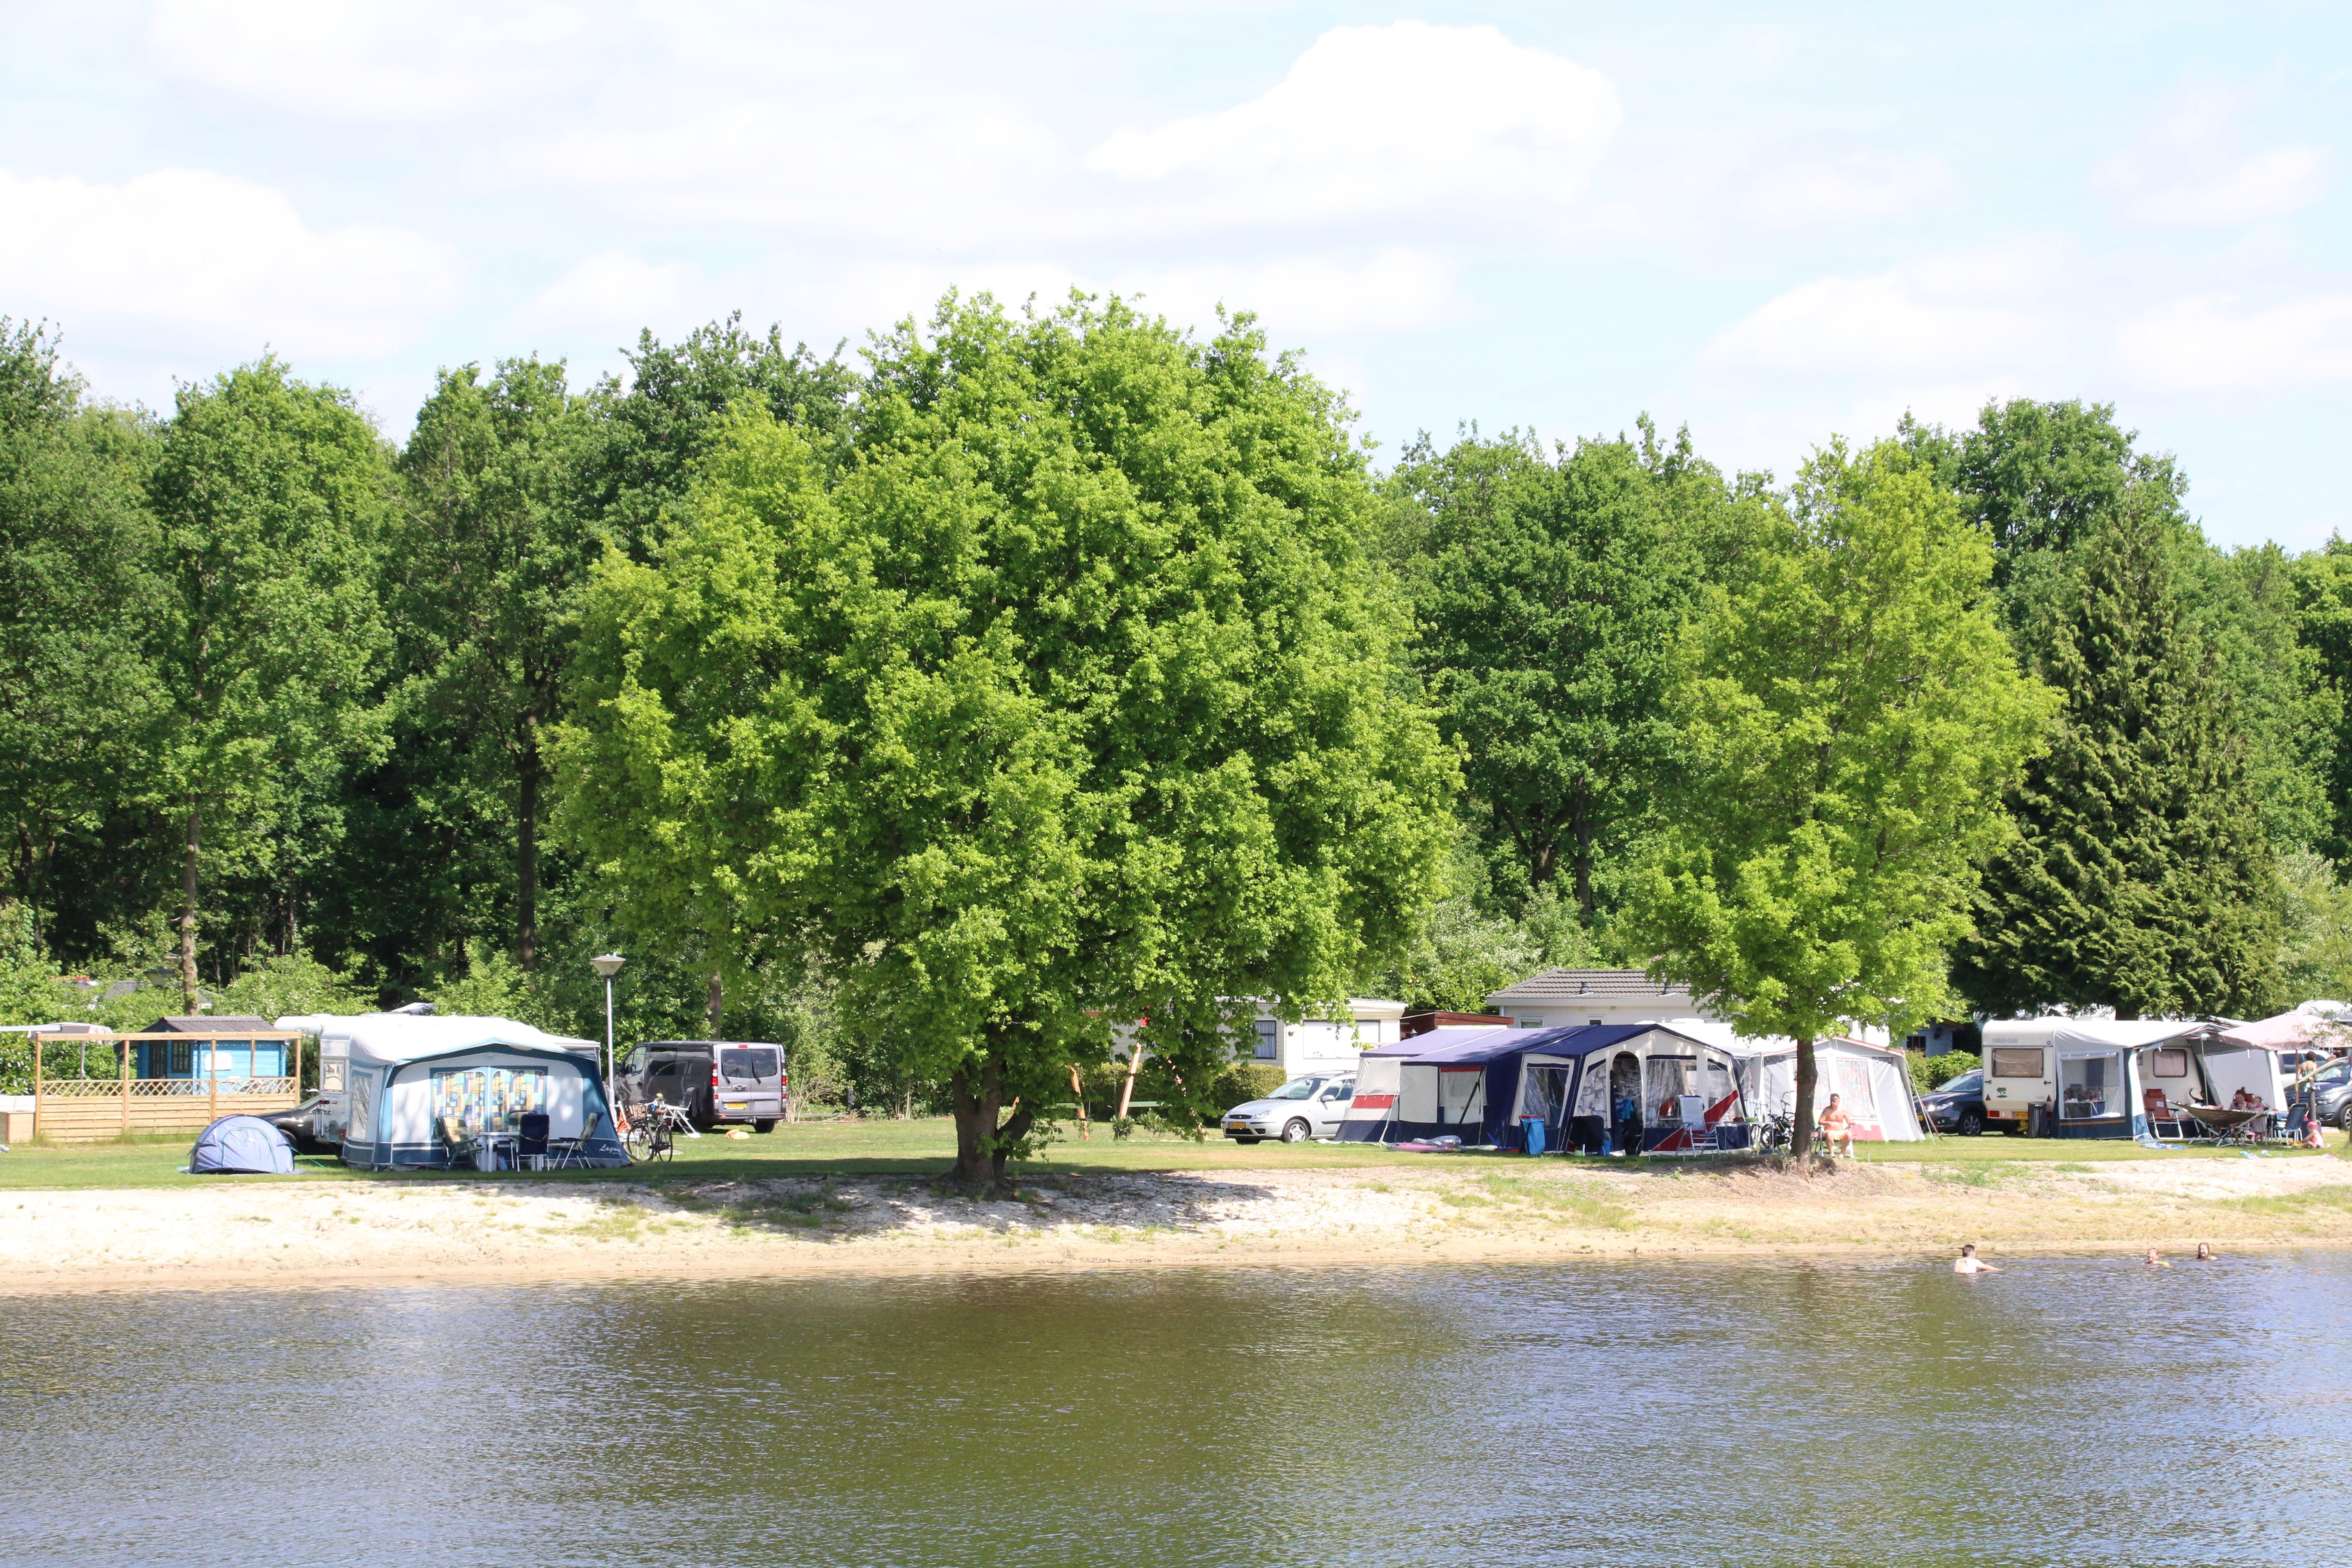 5 Sterne Campingplatz in Hardenberg Het Stoetenslagh -